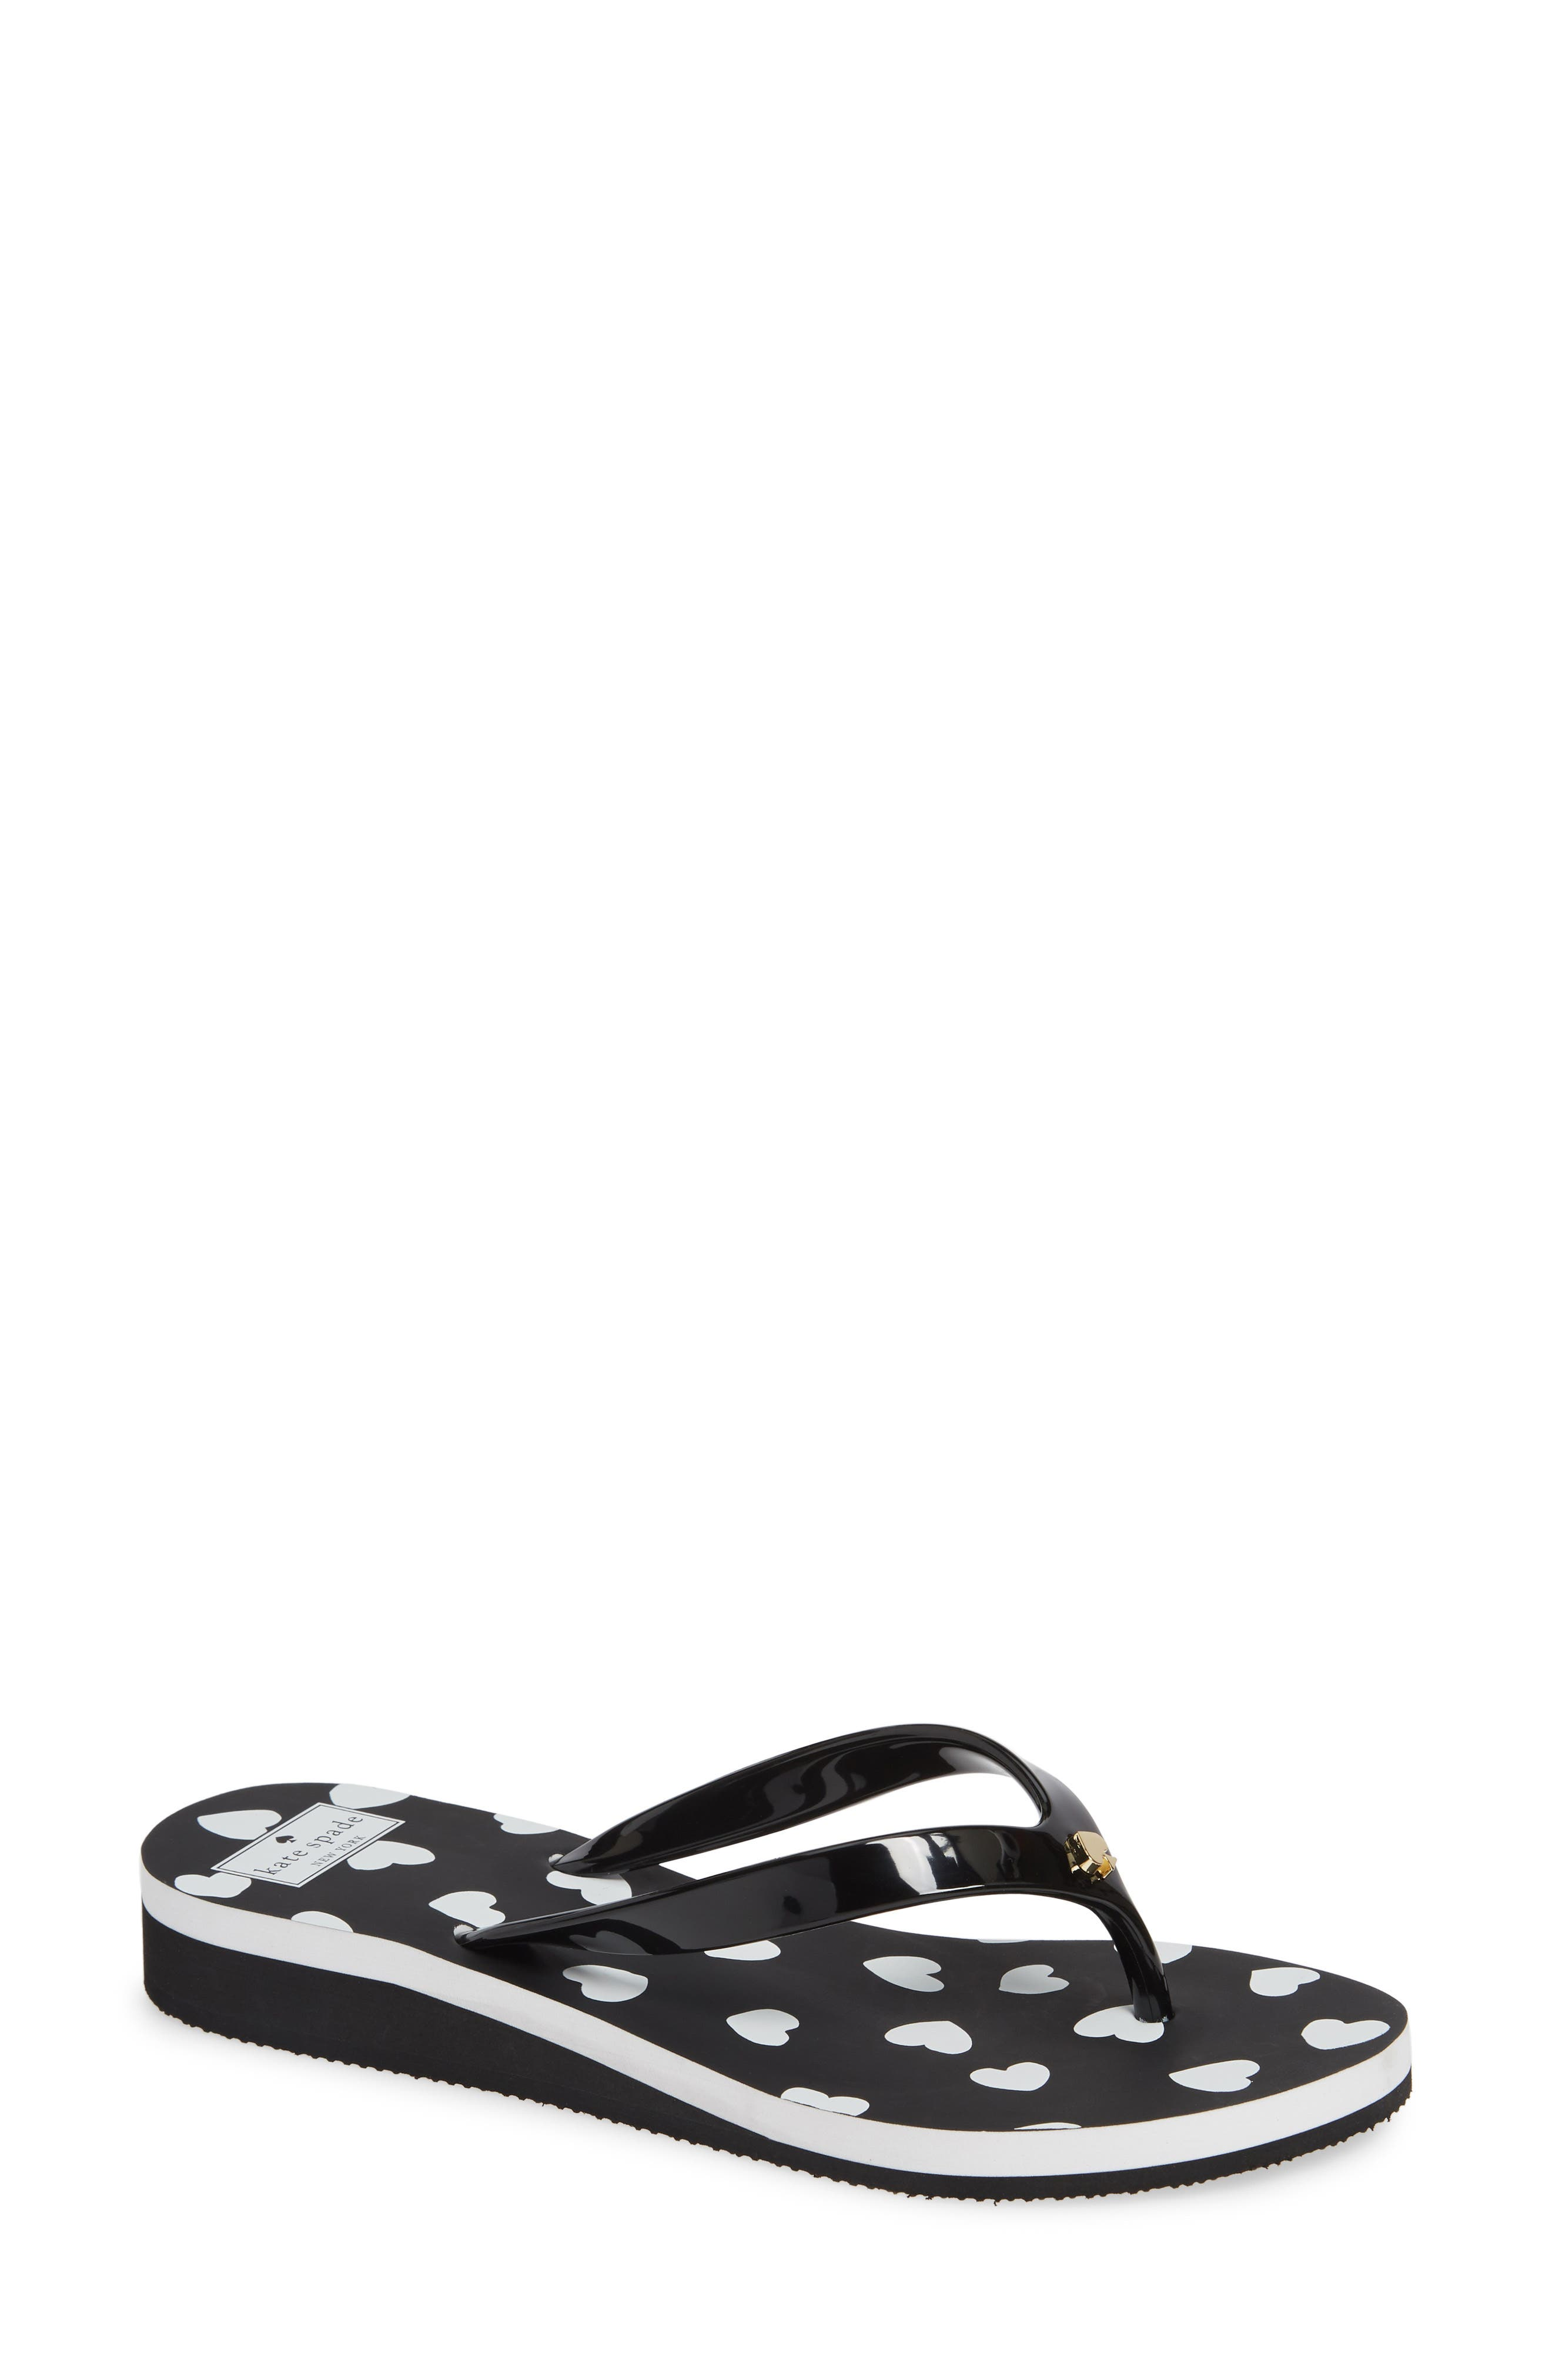 KATE SPADE NEW YORK milli wedge flip-flop, Main, color, BLACK/ WHITE HEART